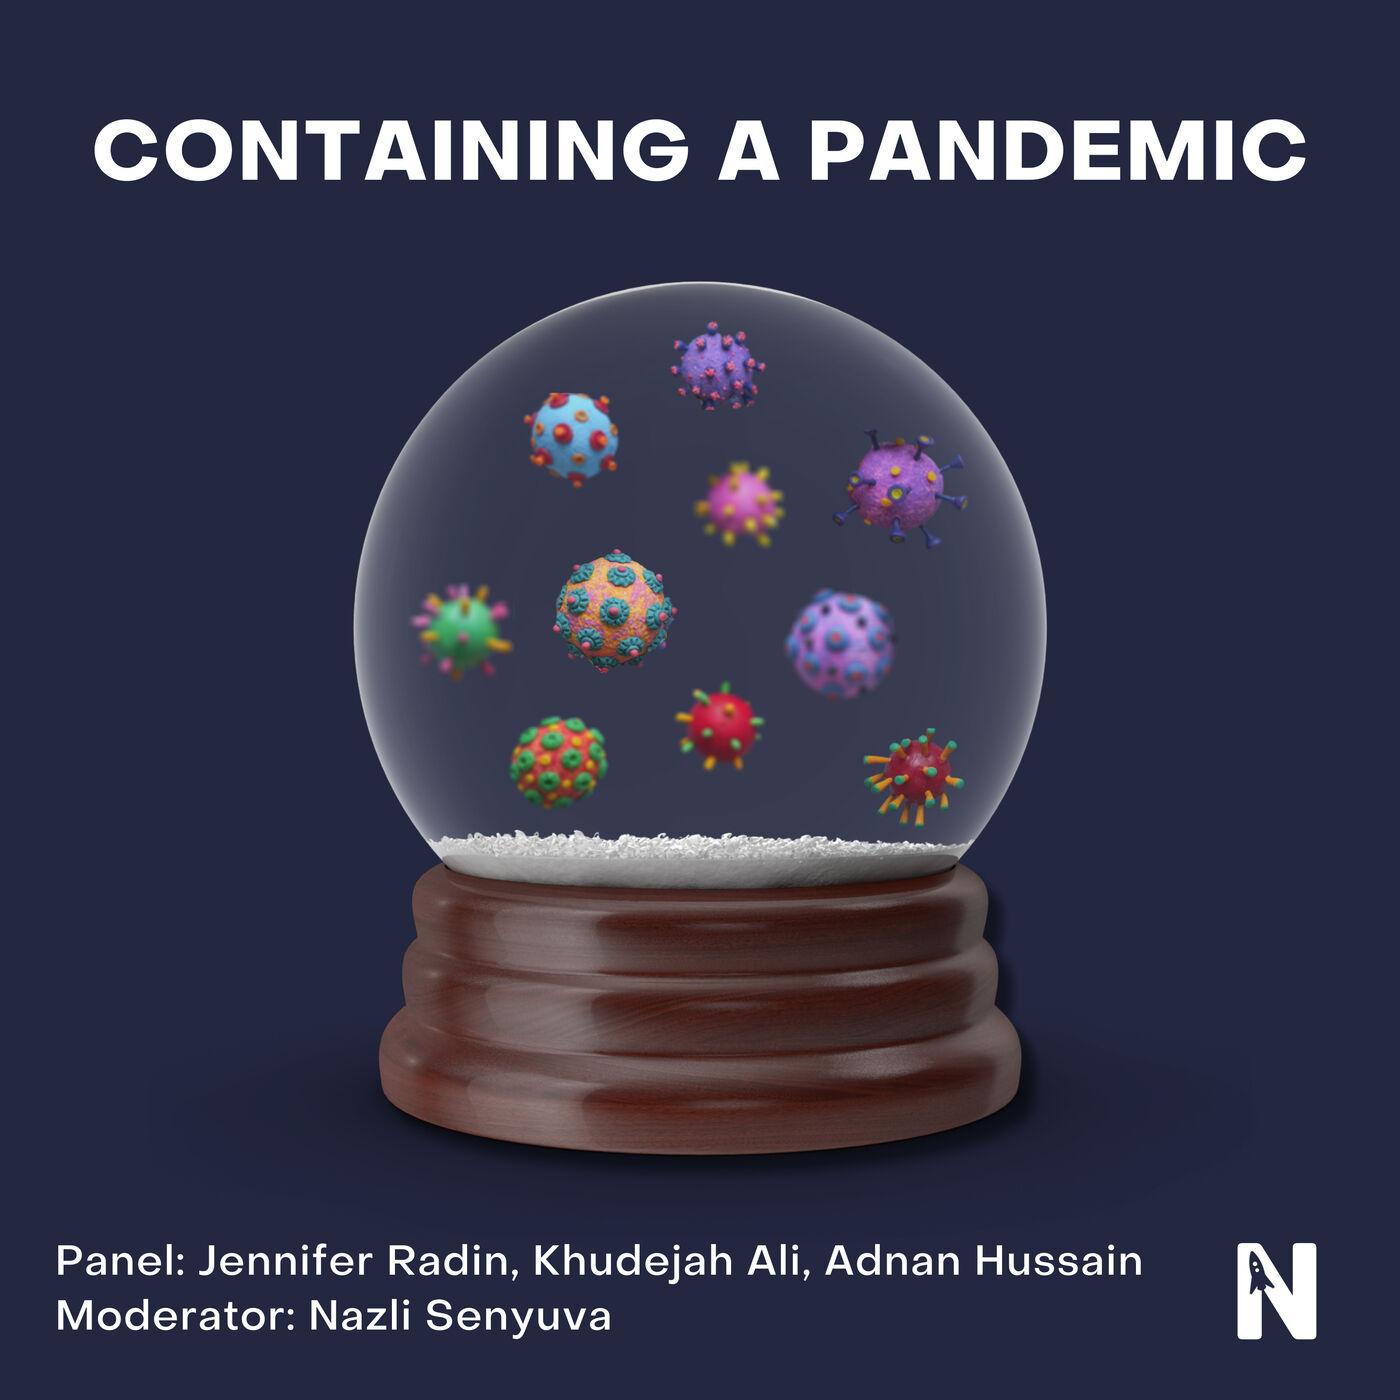 Containing a Pandemic   Jennifer Radin, Khudejah Ali, Adnan Hussain, Nazli Senyuva